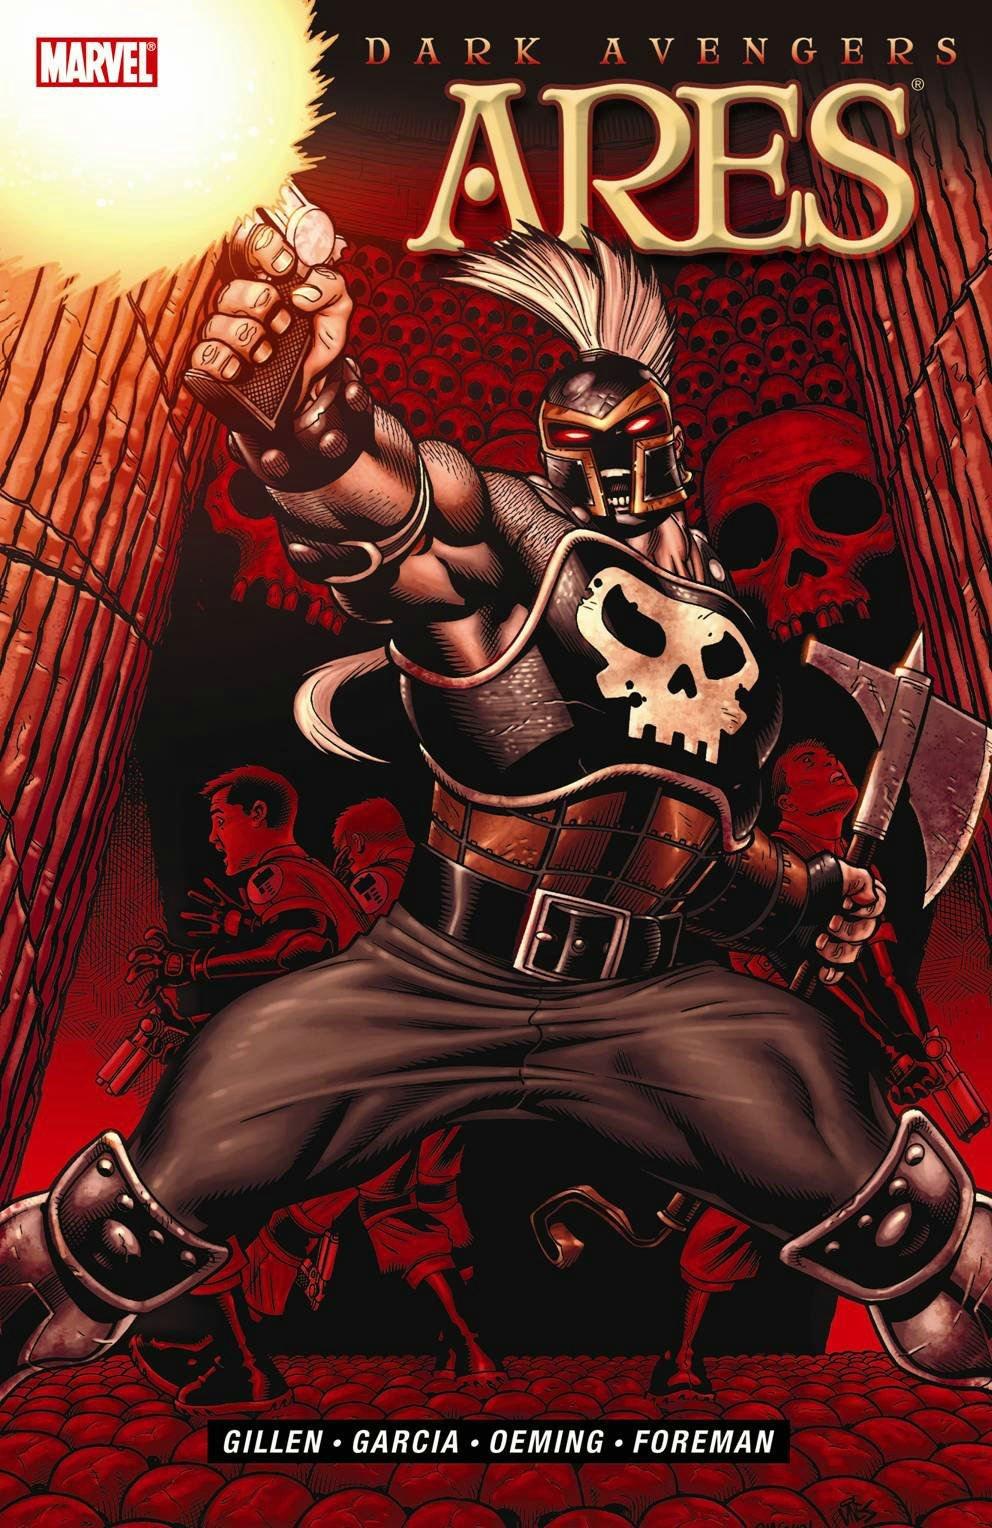 dark avengers ares kieron gillen michael avon oeming manuel